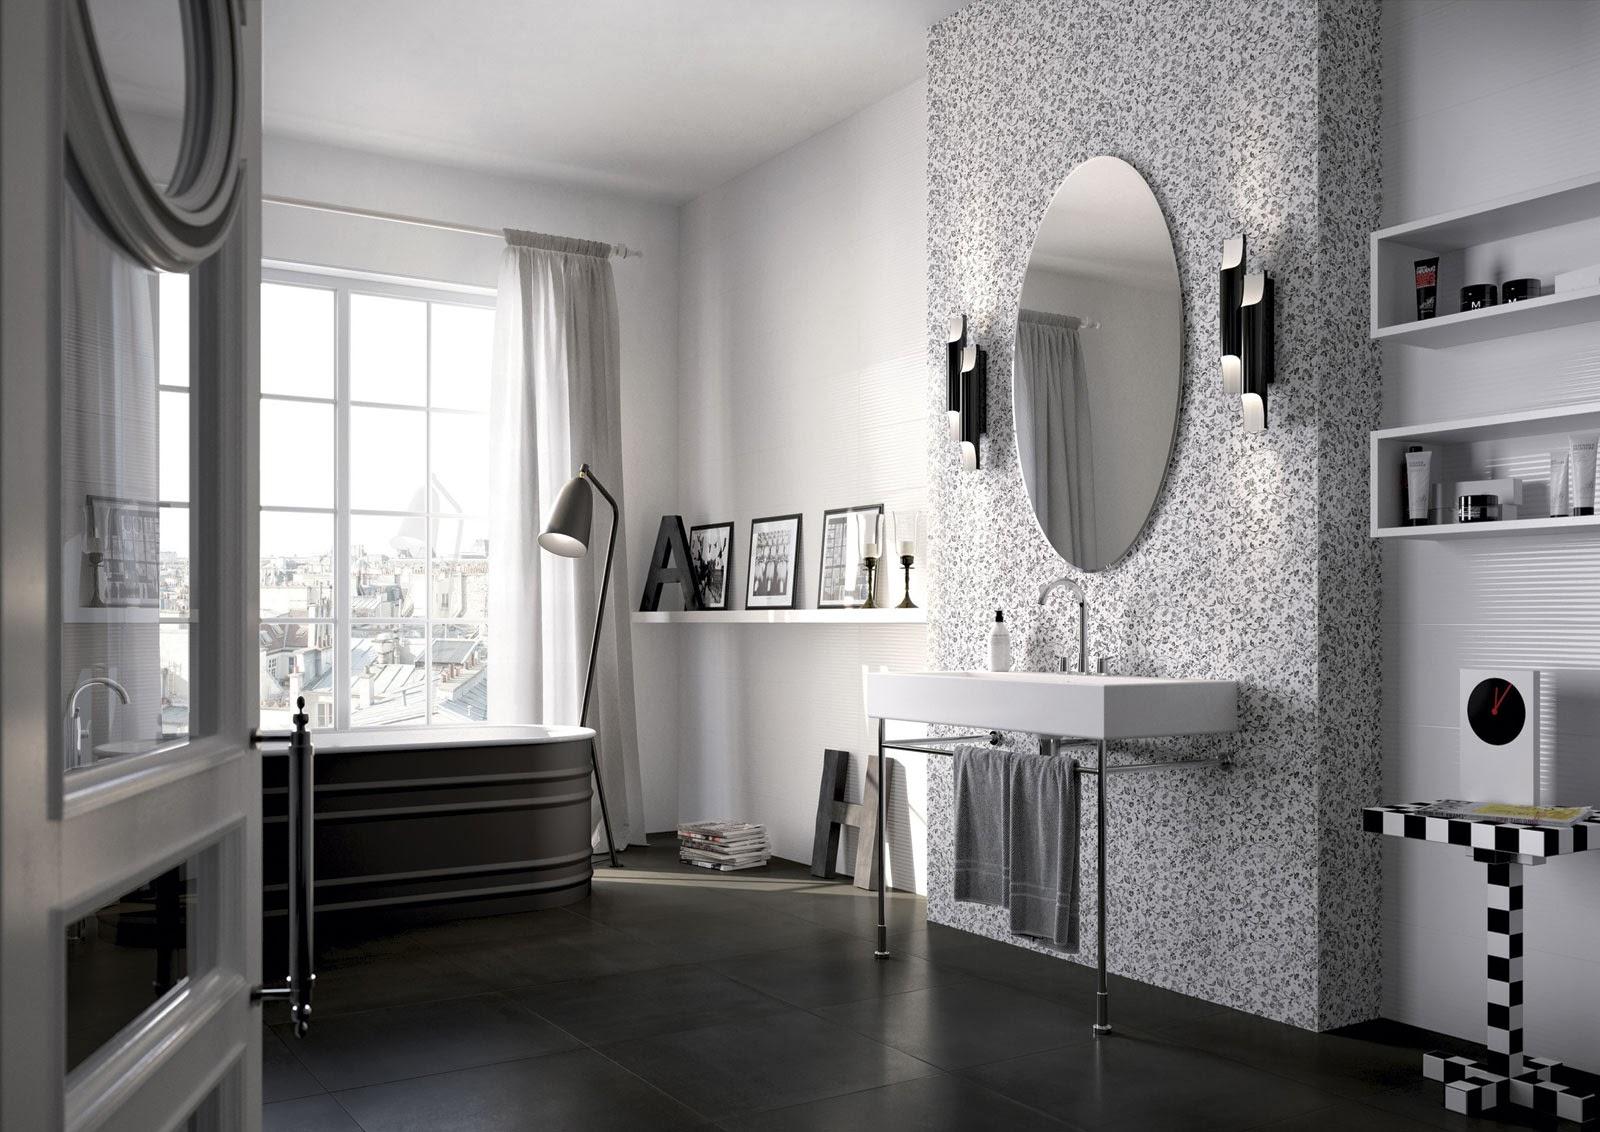 Home garden les salles de bains aubade for Lacroix salle de bain